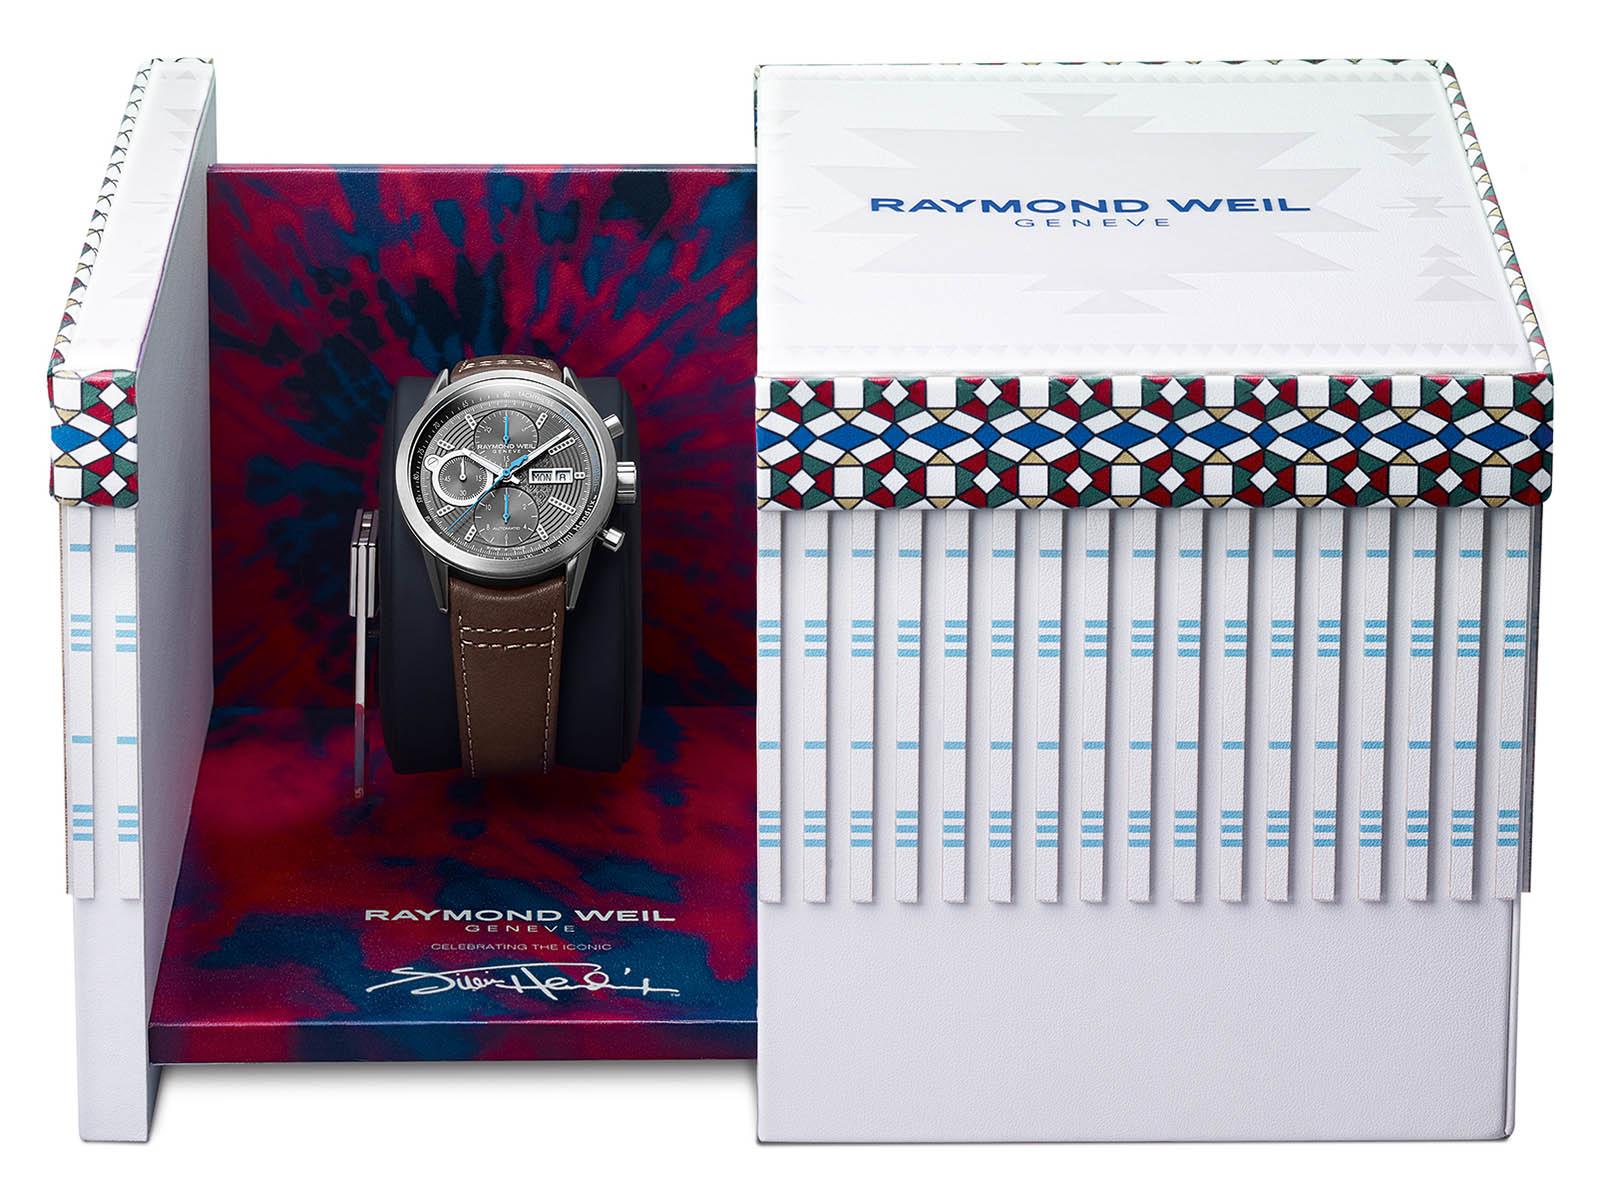 7730-stc-jhdx1-raymond-weil-freelancer-jimi-hendrix-limited-edition-7.jpg